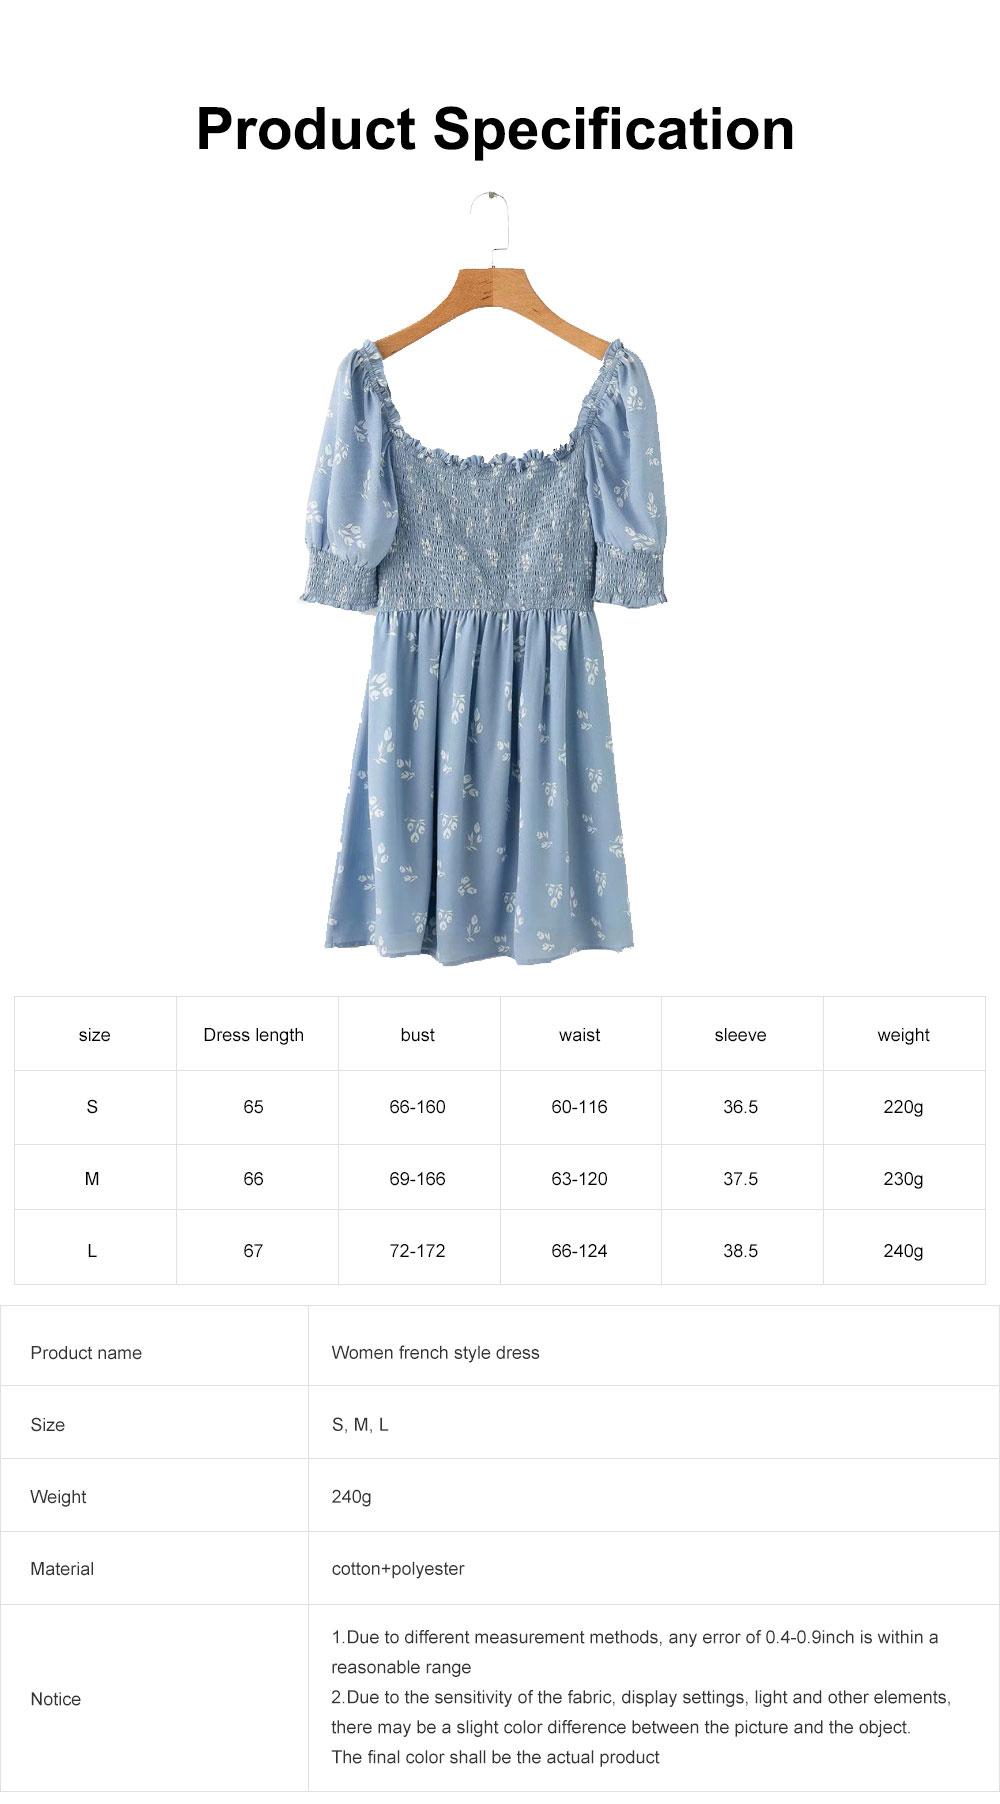 One Piece French Style Women Dress Pleated &High Waist Knee Length Summer Dress Ruffle Sleeve Dress for Women's Gifts 6